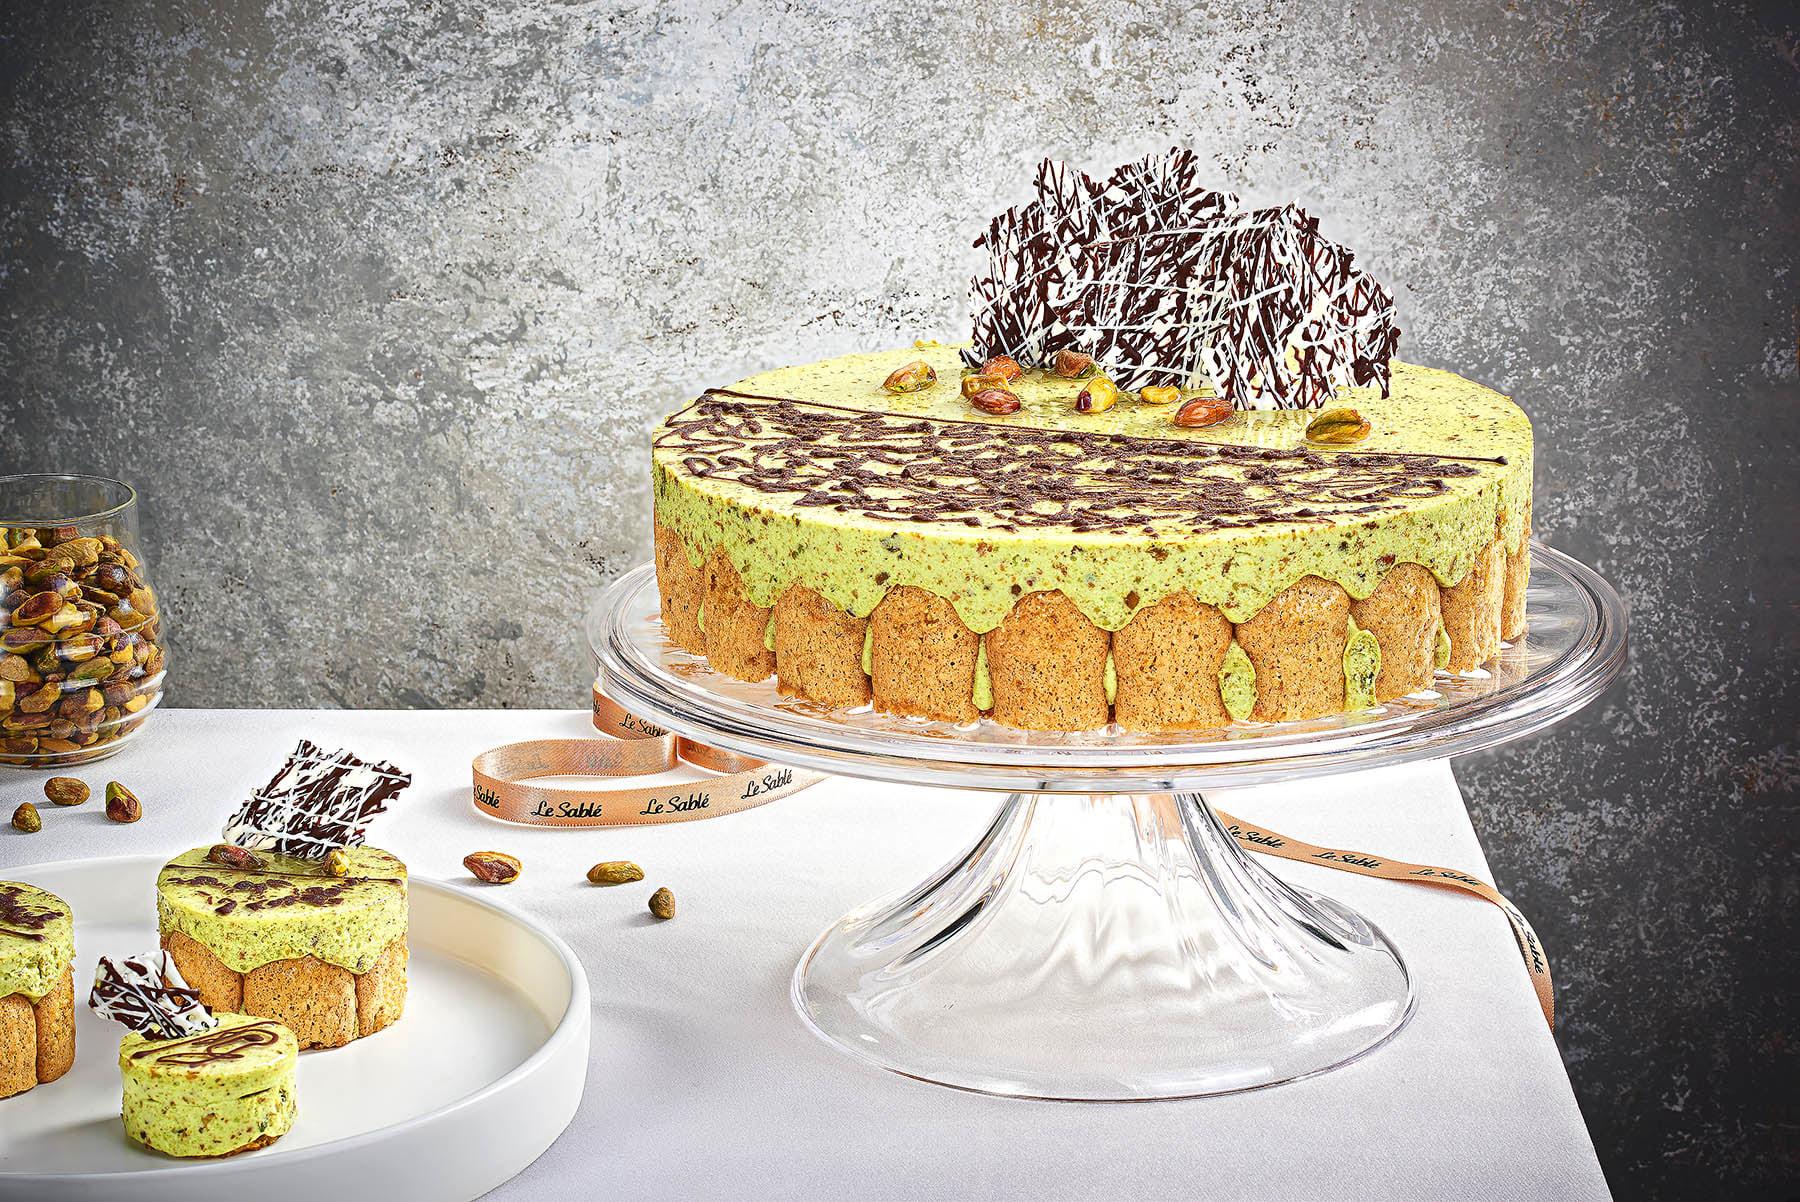 Le Sable - Pistachio Cake - Mohamed Abdel-Hady Photography